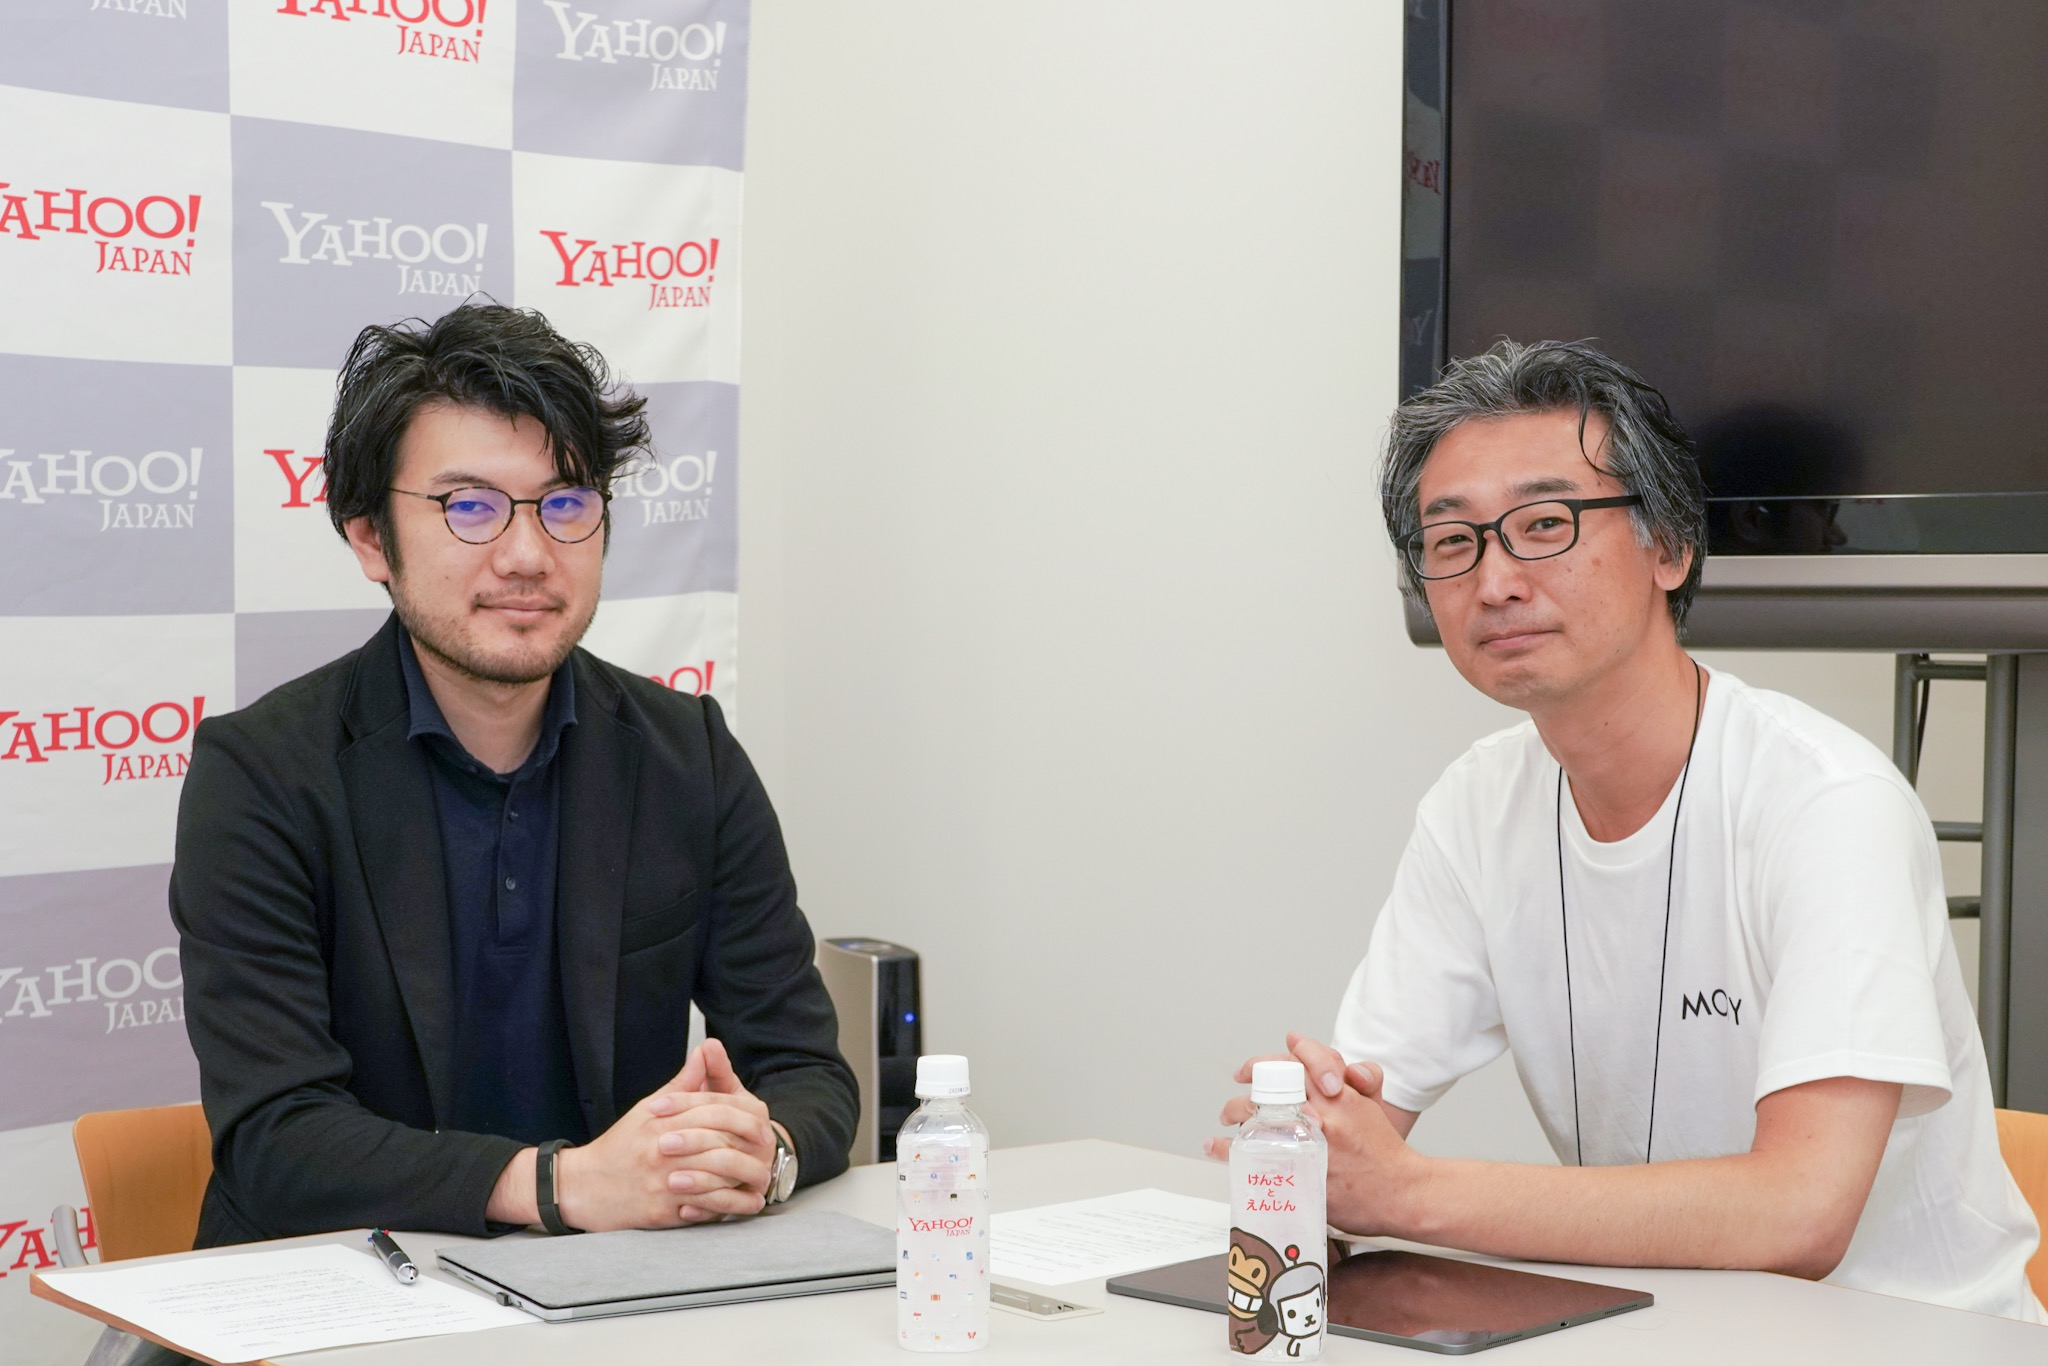 Yahoo!カーナビ インタビュー